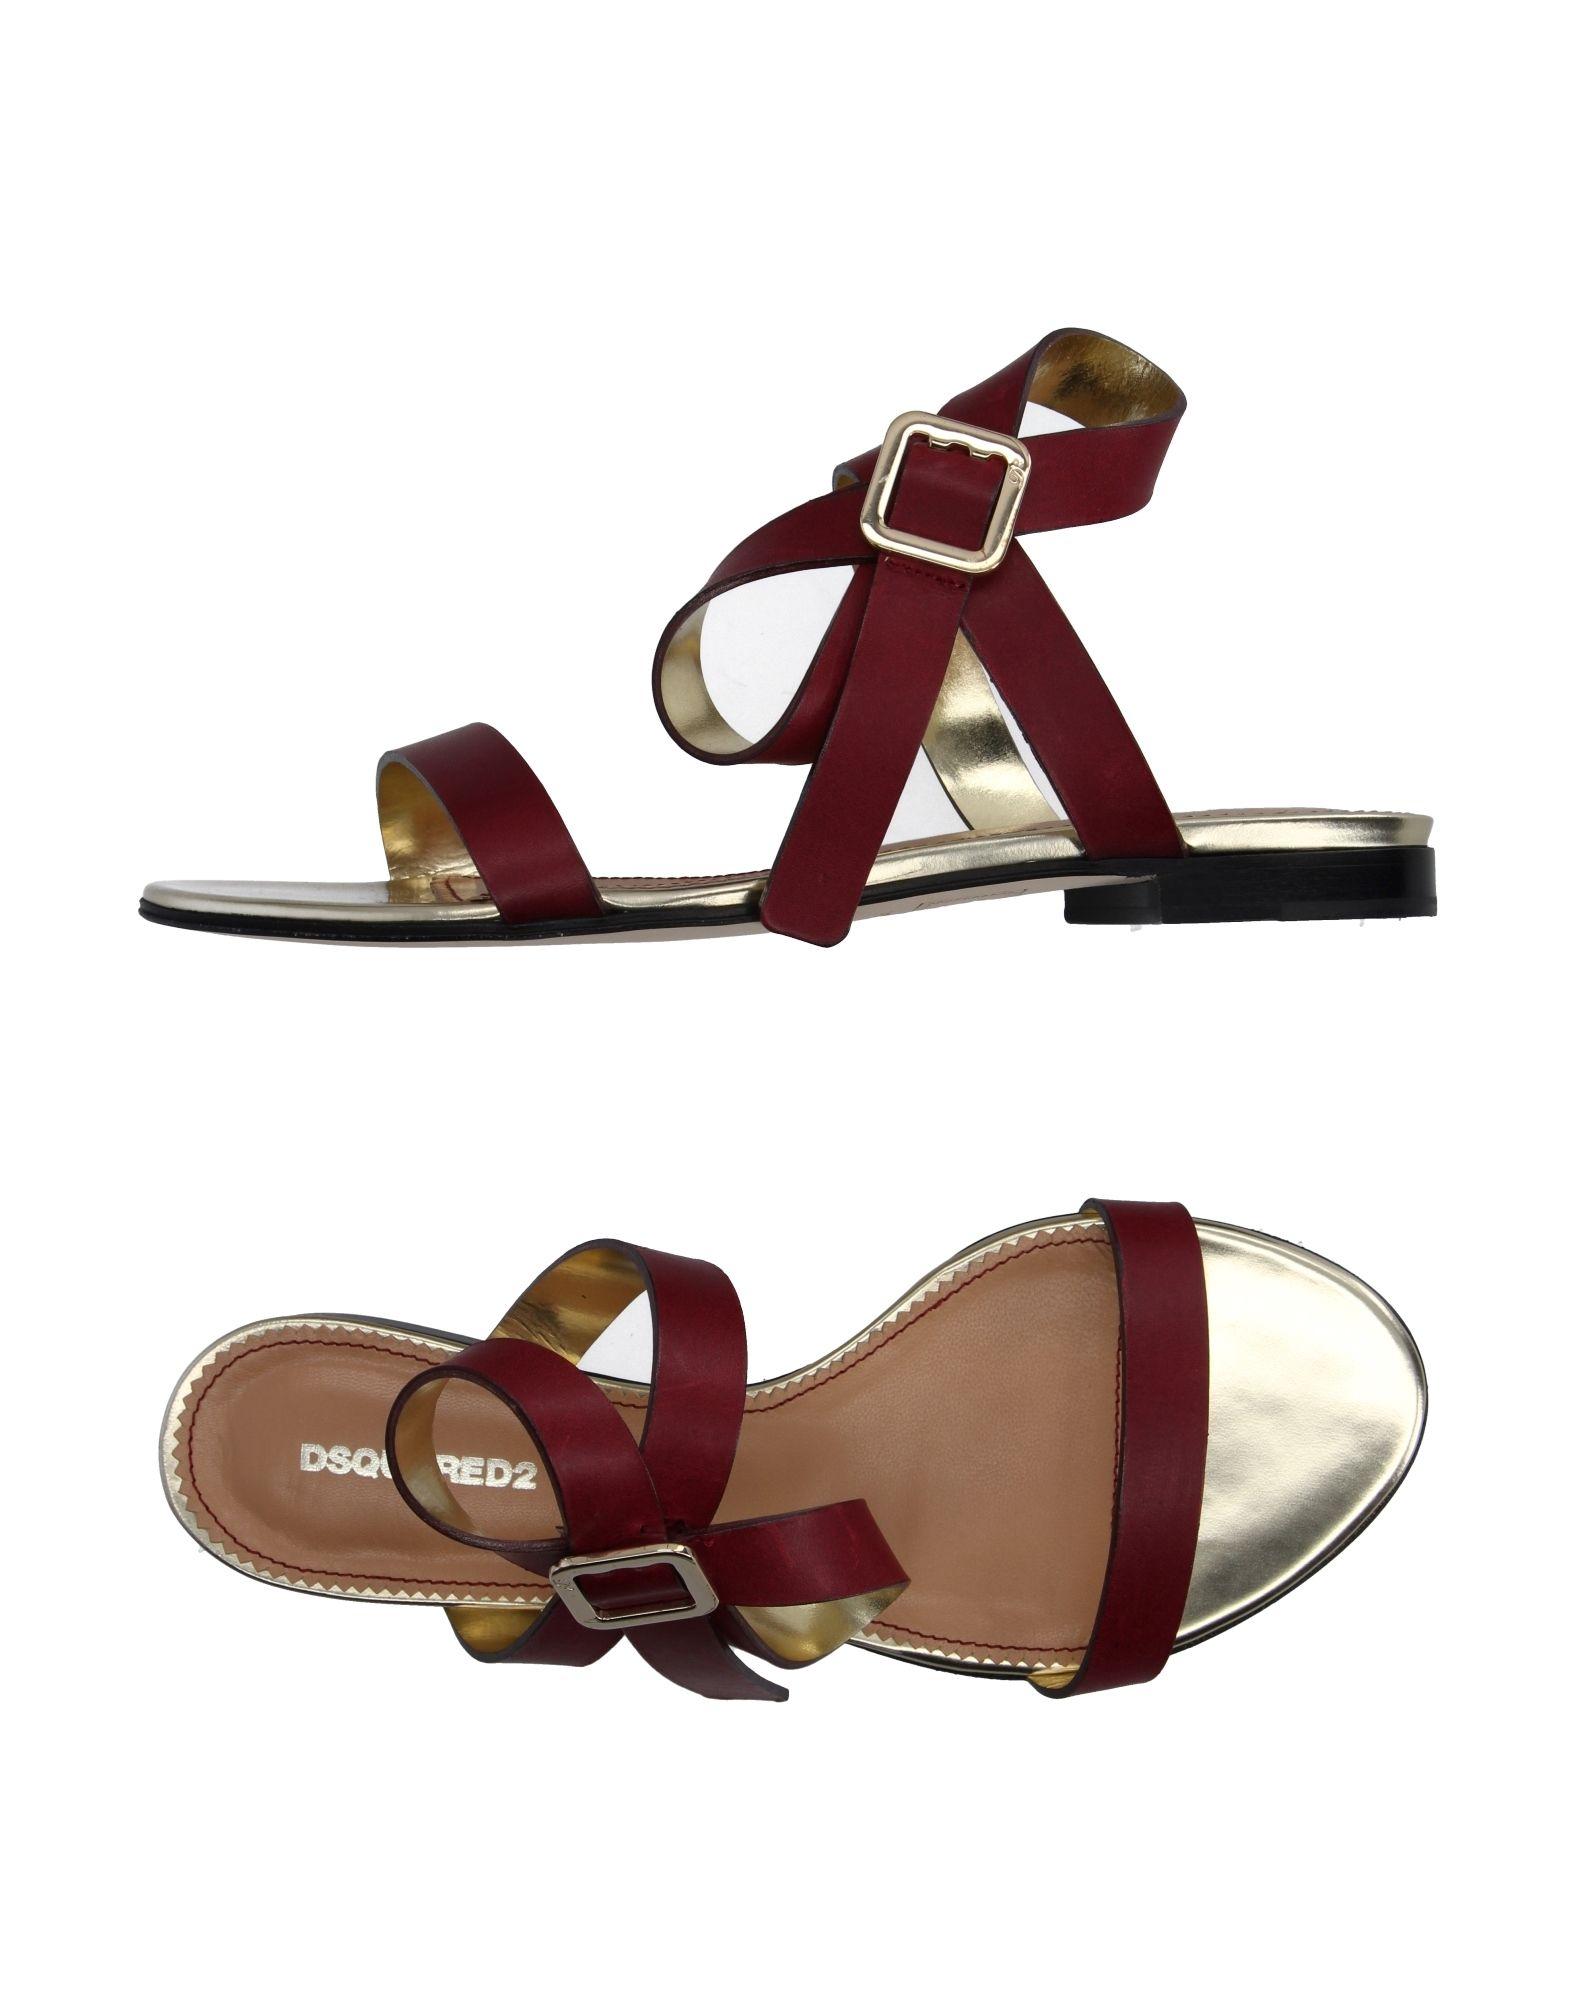 DsquaROT2 Sandalen Damen 11068941CQGut Schuhe aussehende strapazierfähige Schuhe 11068941CQGut 339d5b